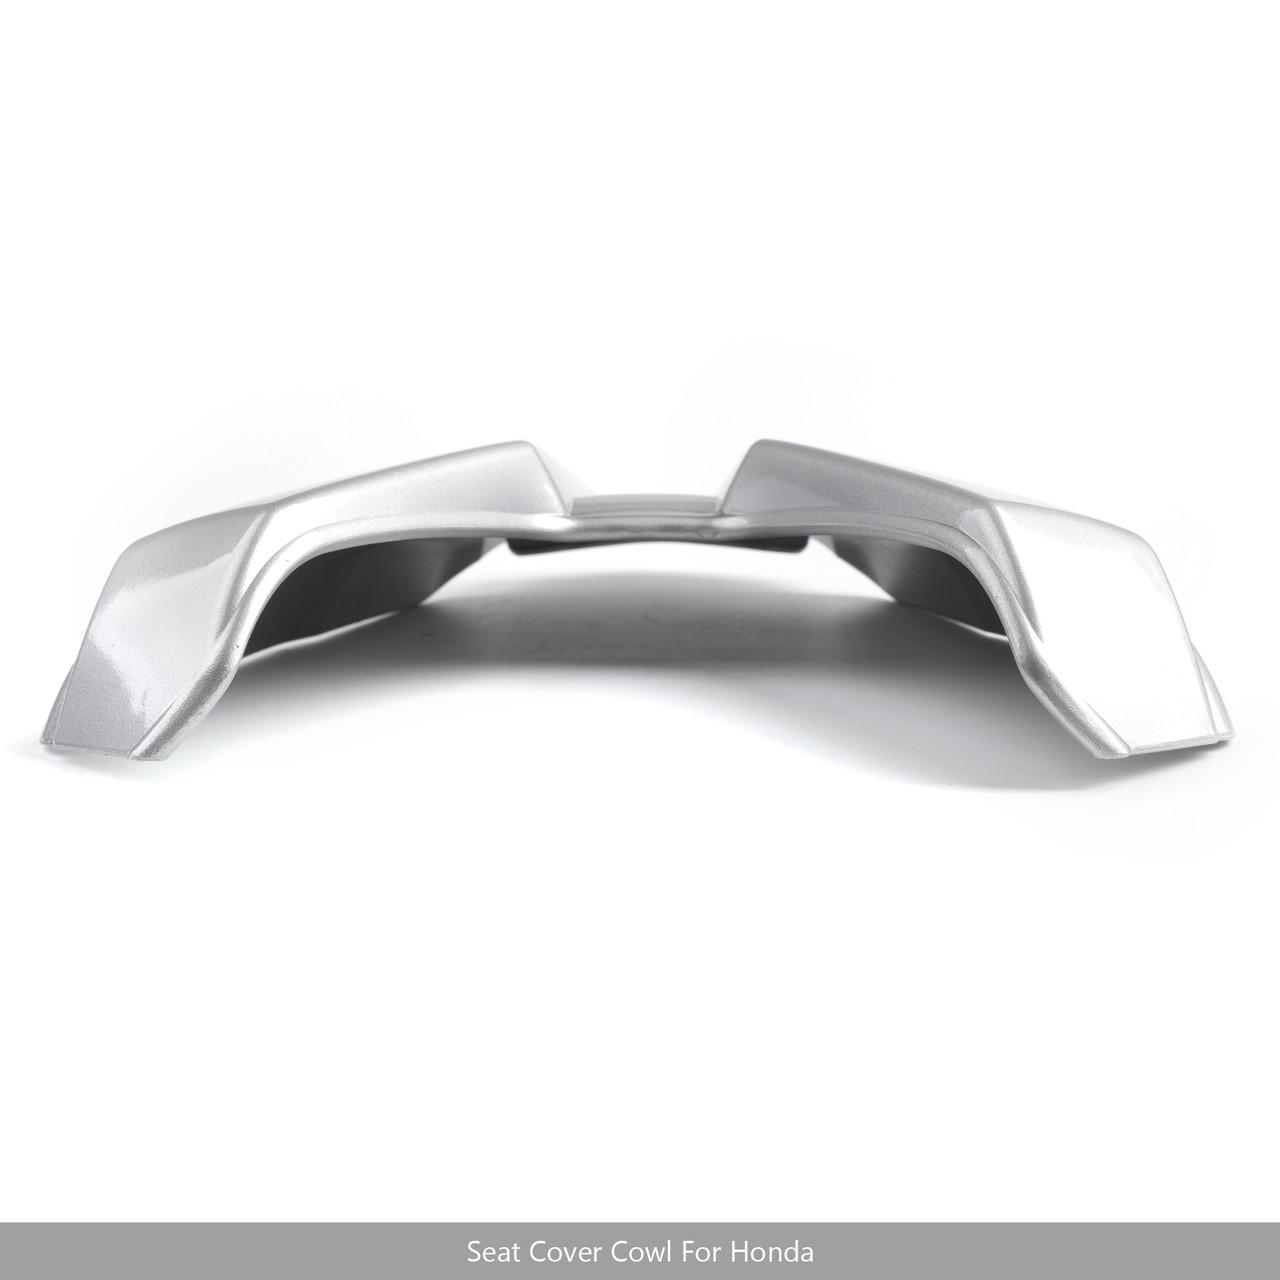 Rear Seat Passenger Cover Cowl Fairing For Honda CB500F 16-2018 CBR500R 2016-19 Silver